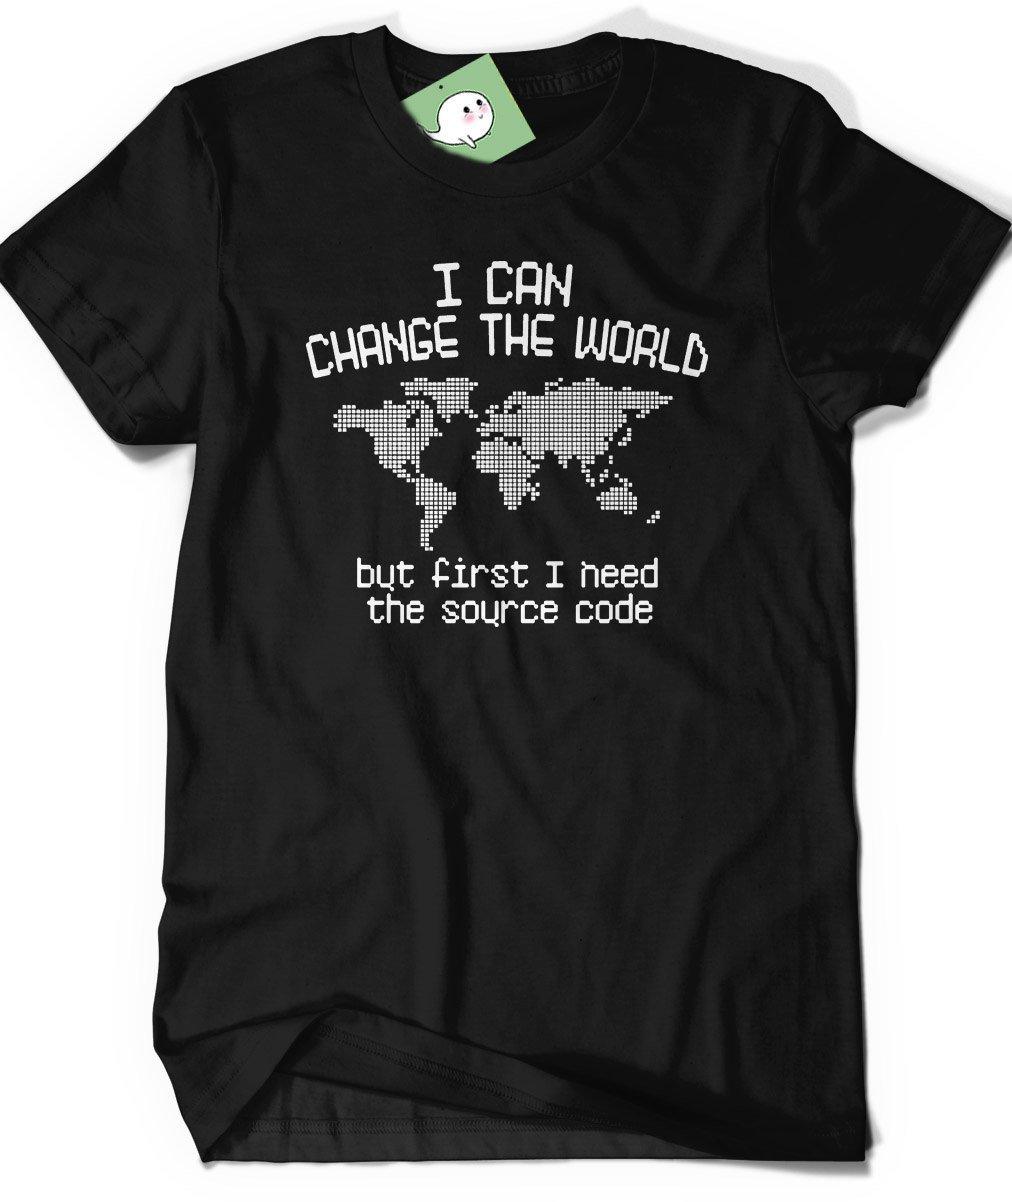 Sarcastic kommentar laden geek nerd herren lustige t hemd casual shirts tops gedruckt kurzarm t-shirts camisetas hombre